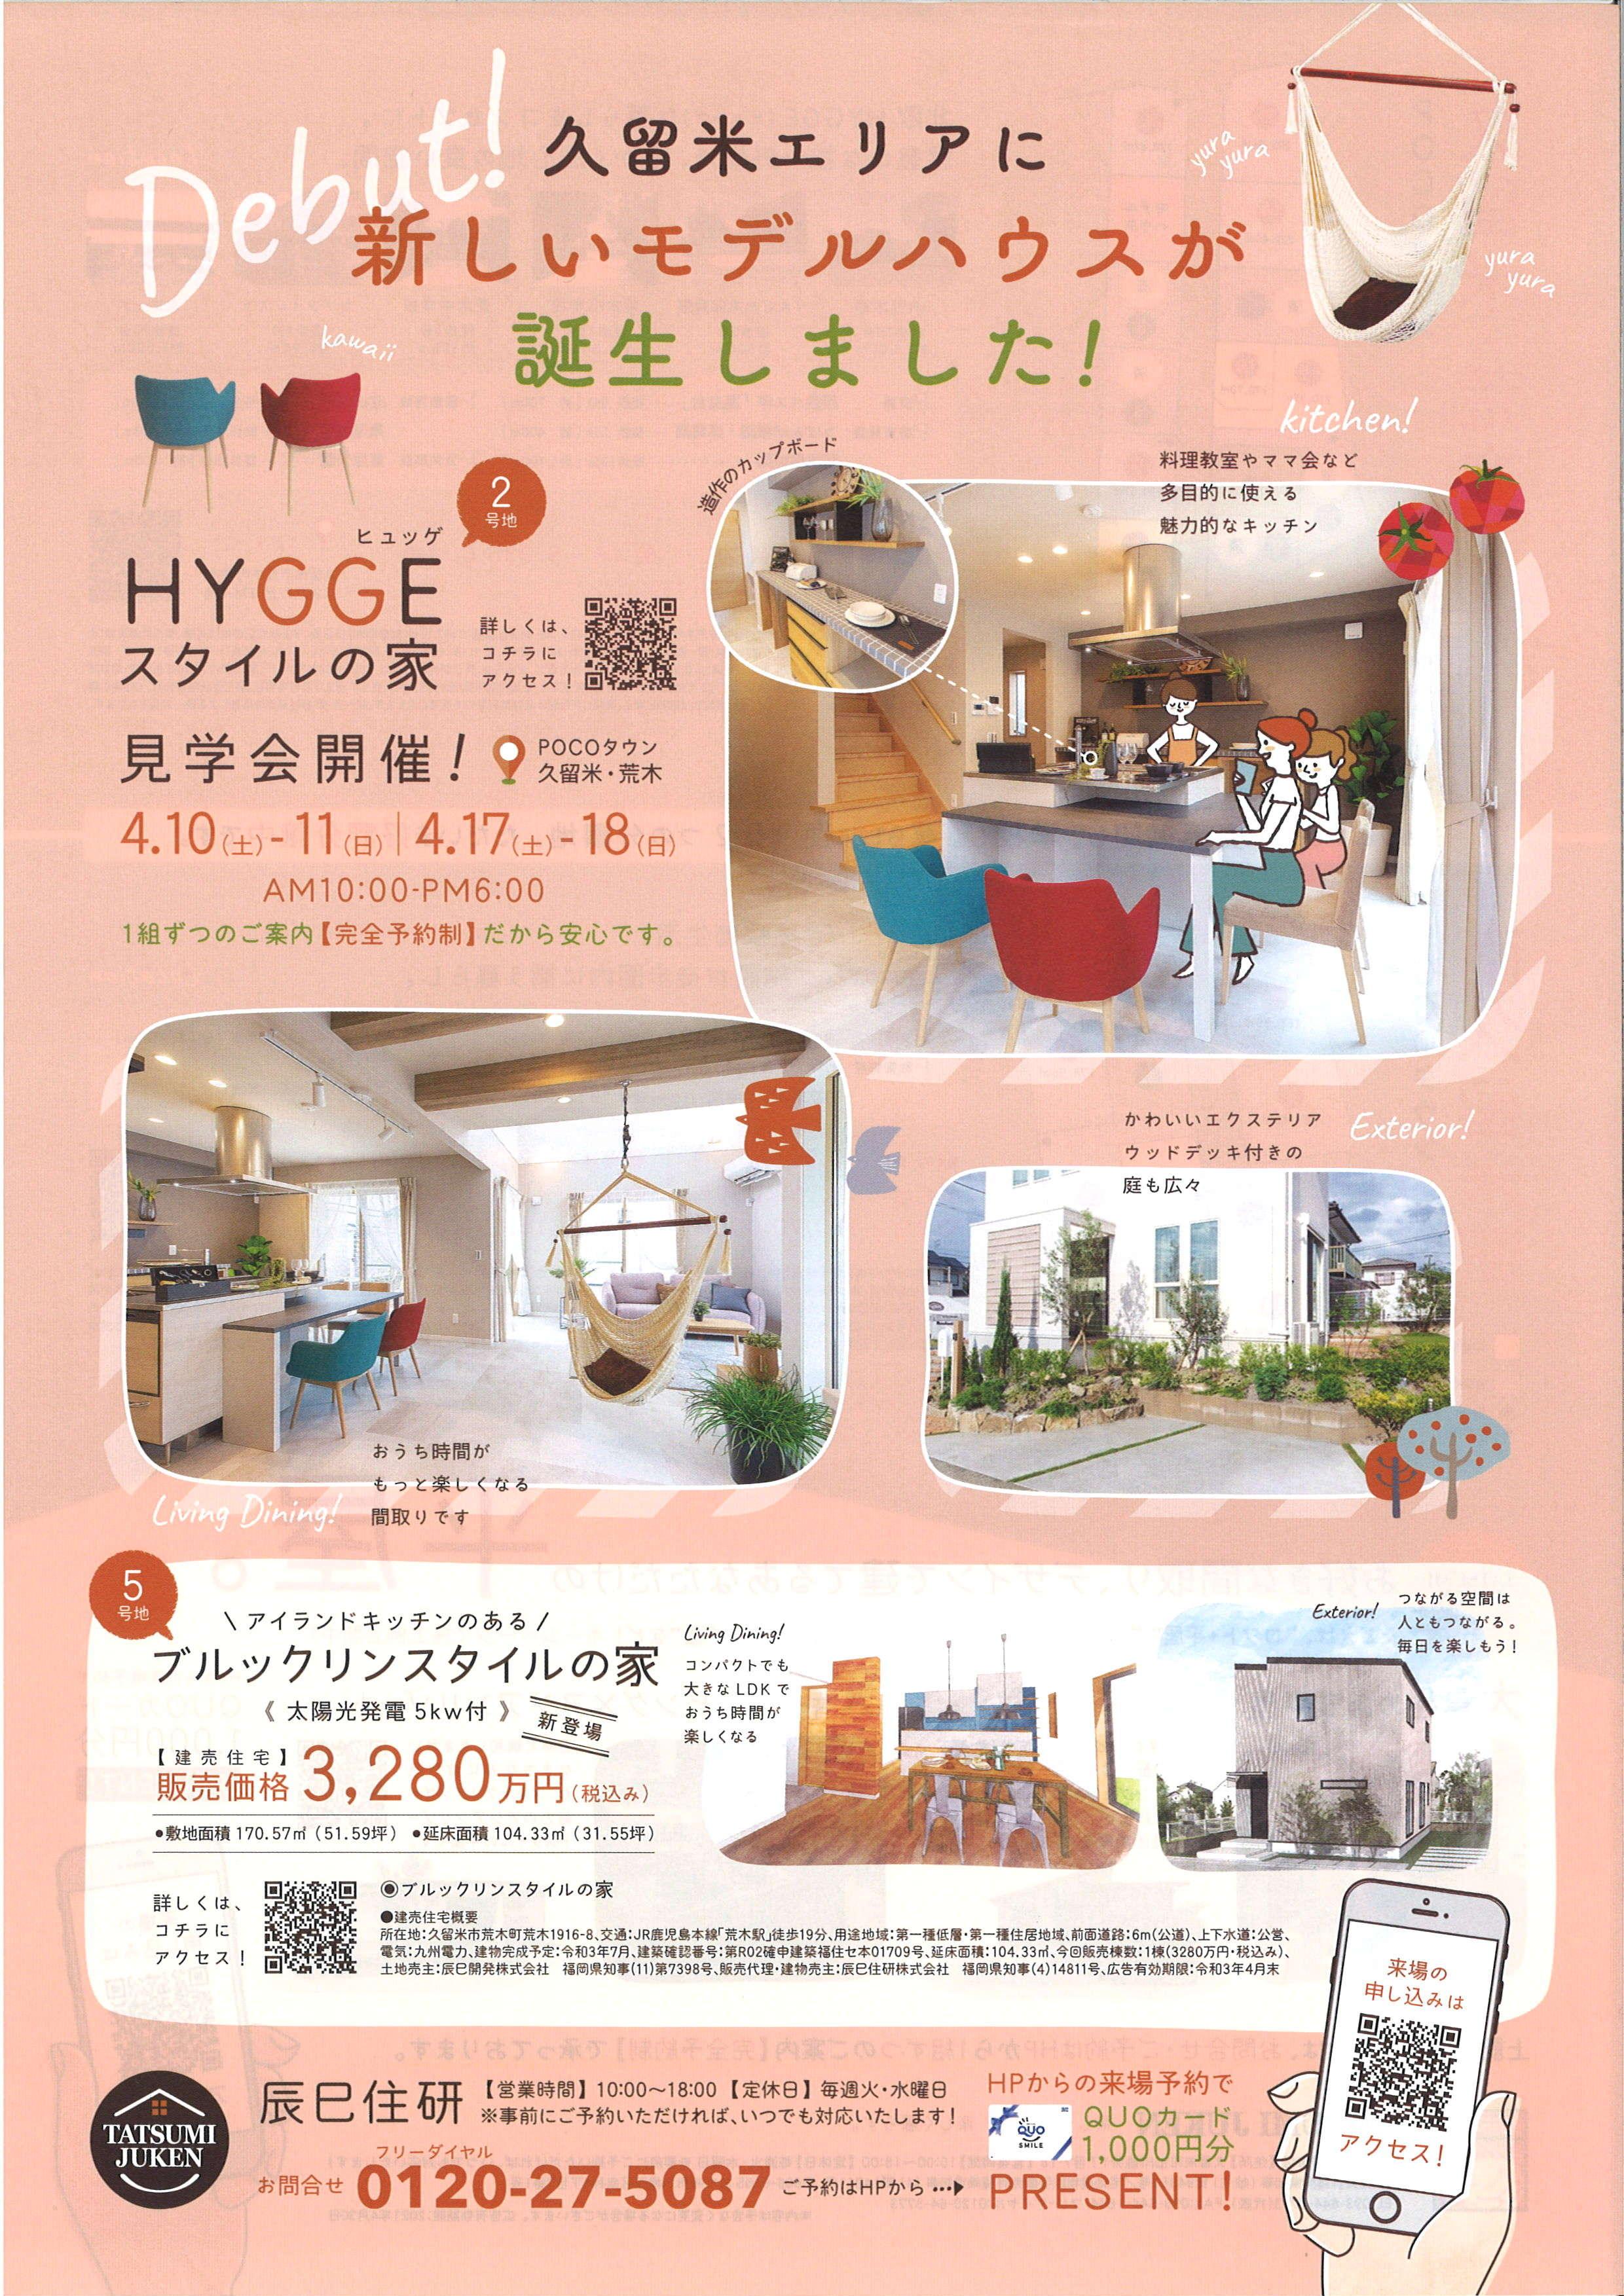 image イベント開催!!新し建売も!!